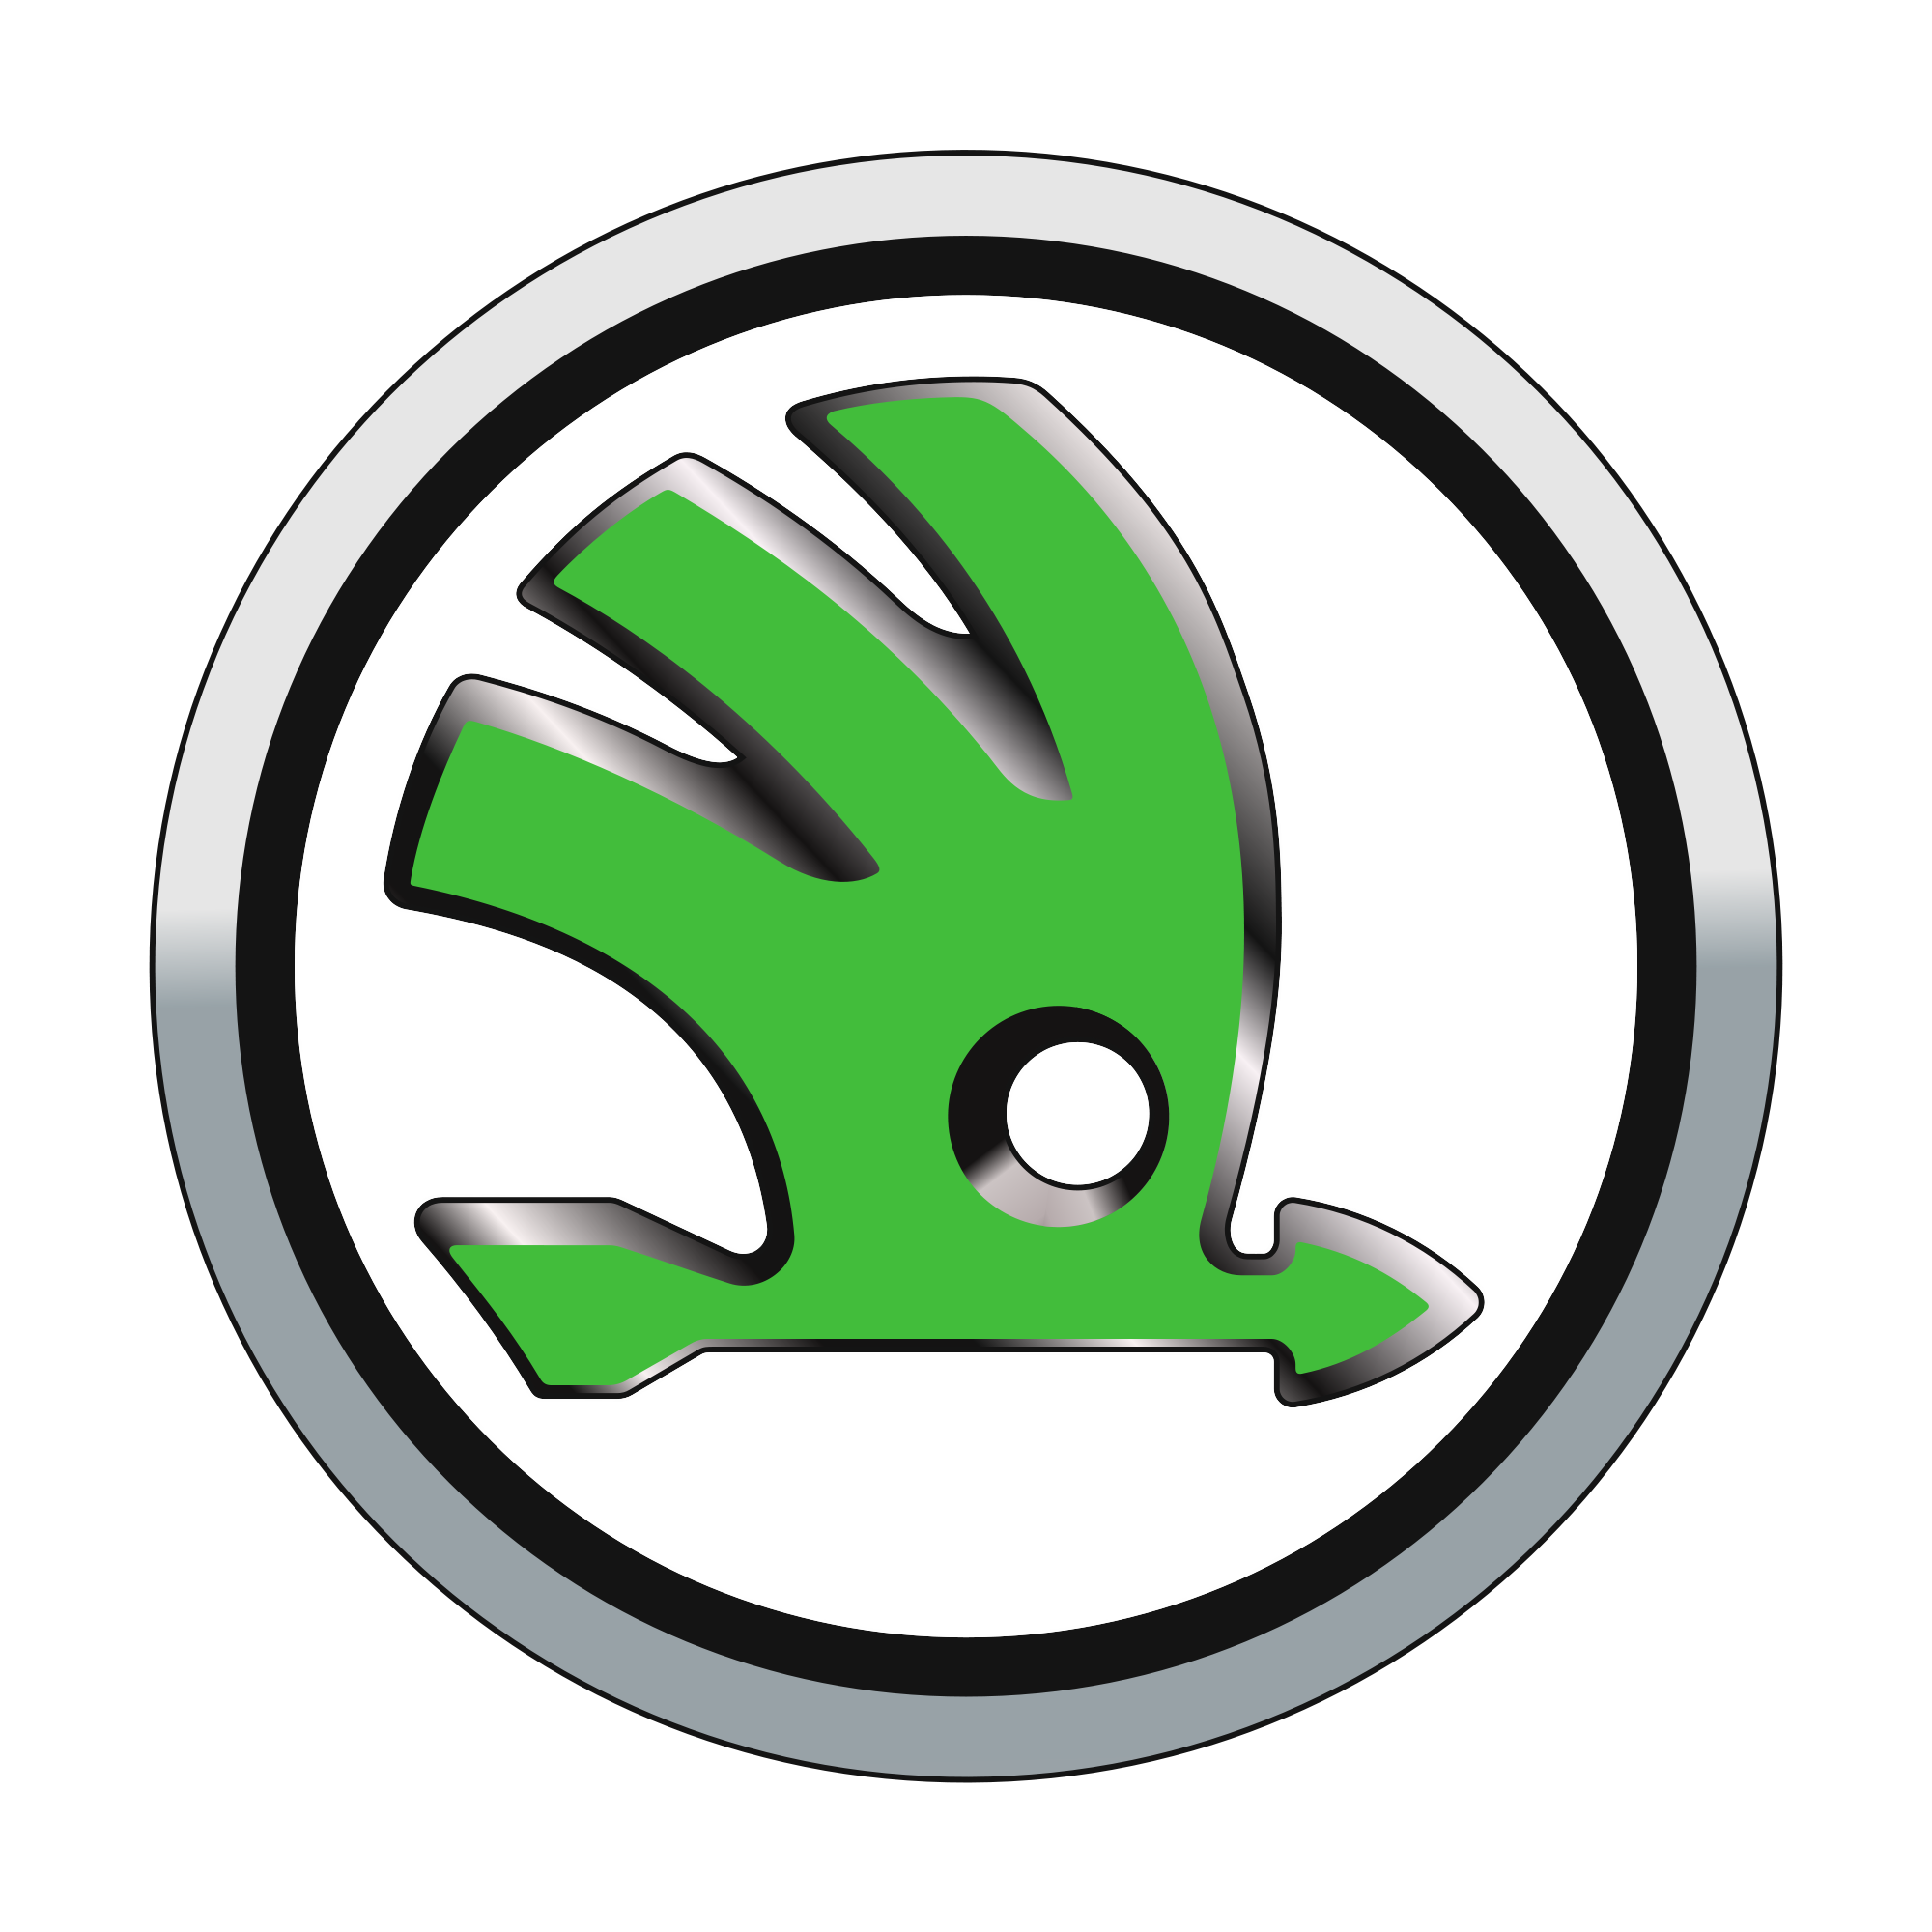 Skoda-logotype